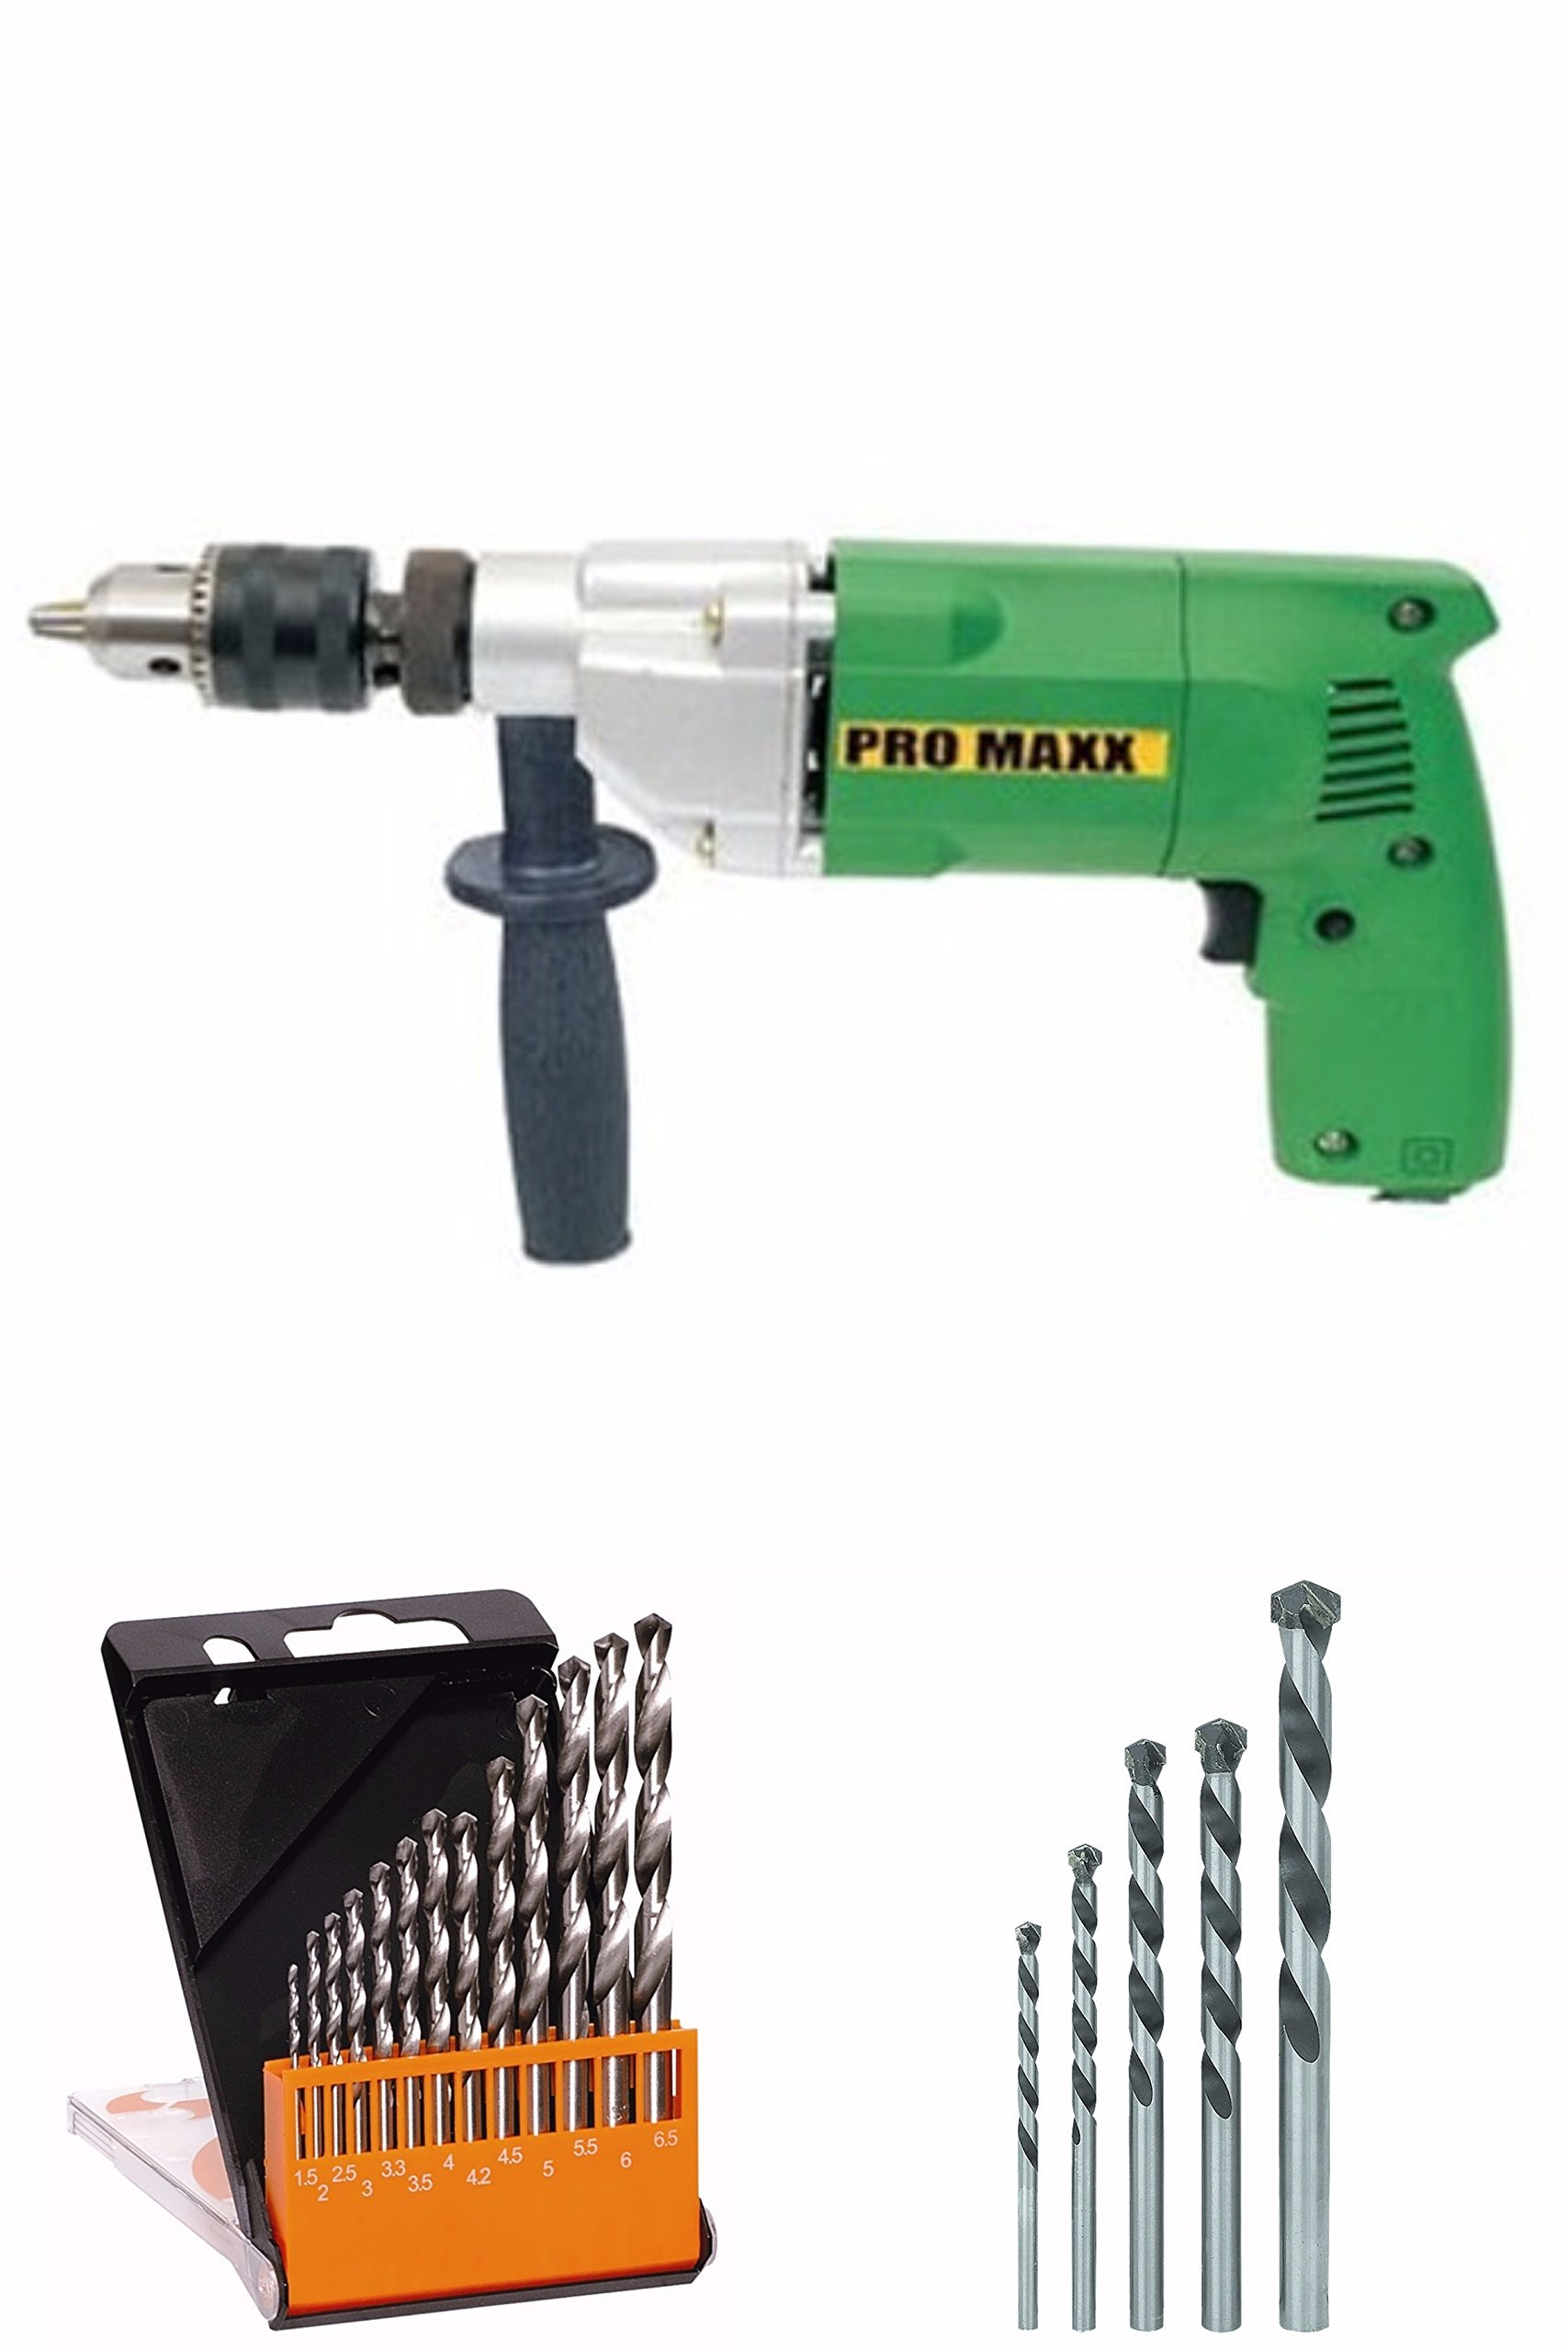 PROMAXX 13 Mm Powerfull Hammer Drill Machine+13Pcs Hss Drill Set For Wood,Metal,Plastic & 5 Pc Masonry Drill Set For Wall,Concretes (Set Of 13)